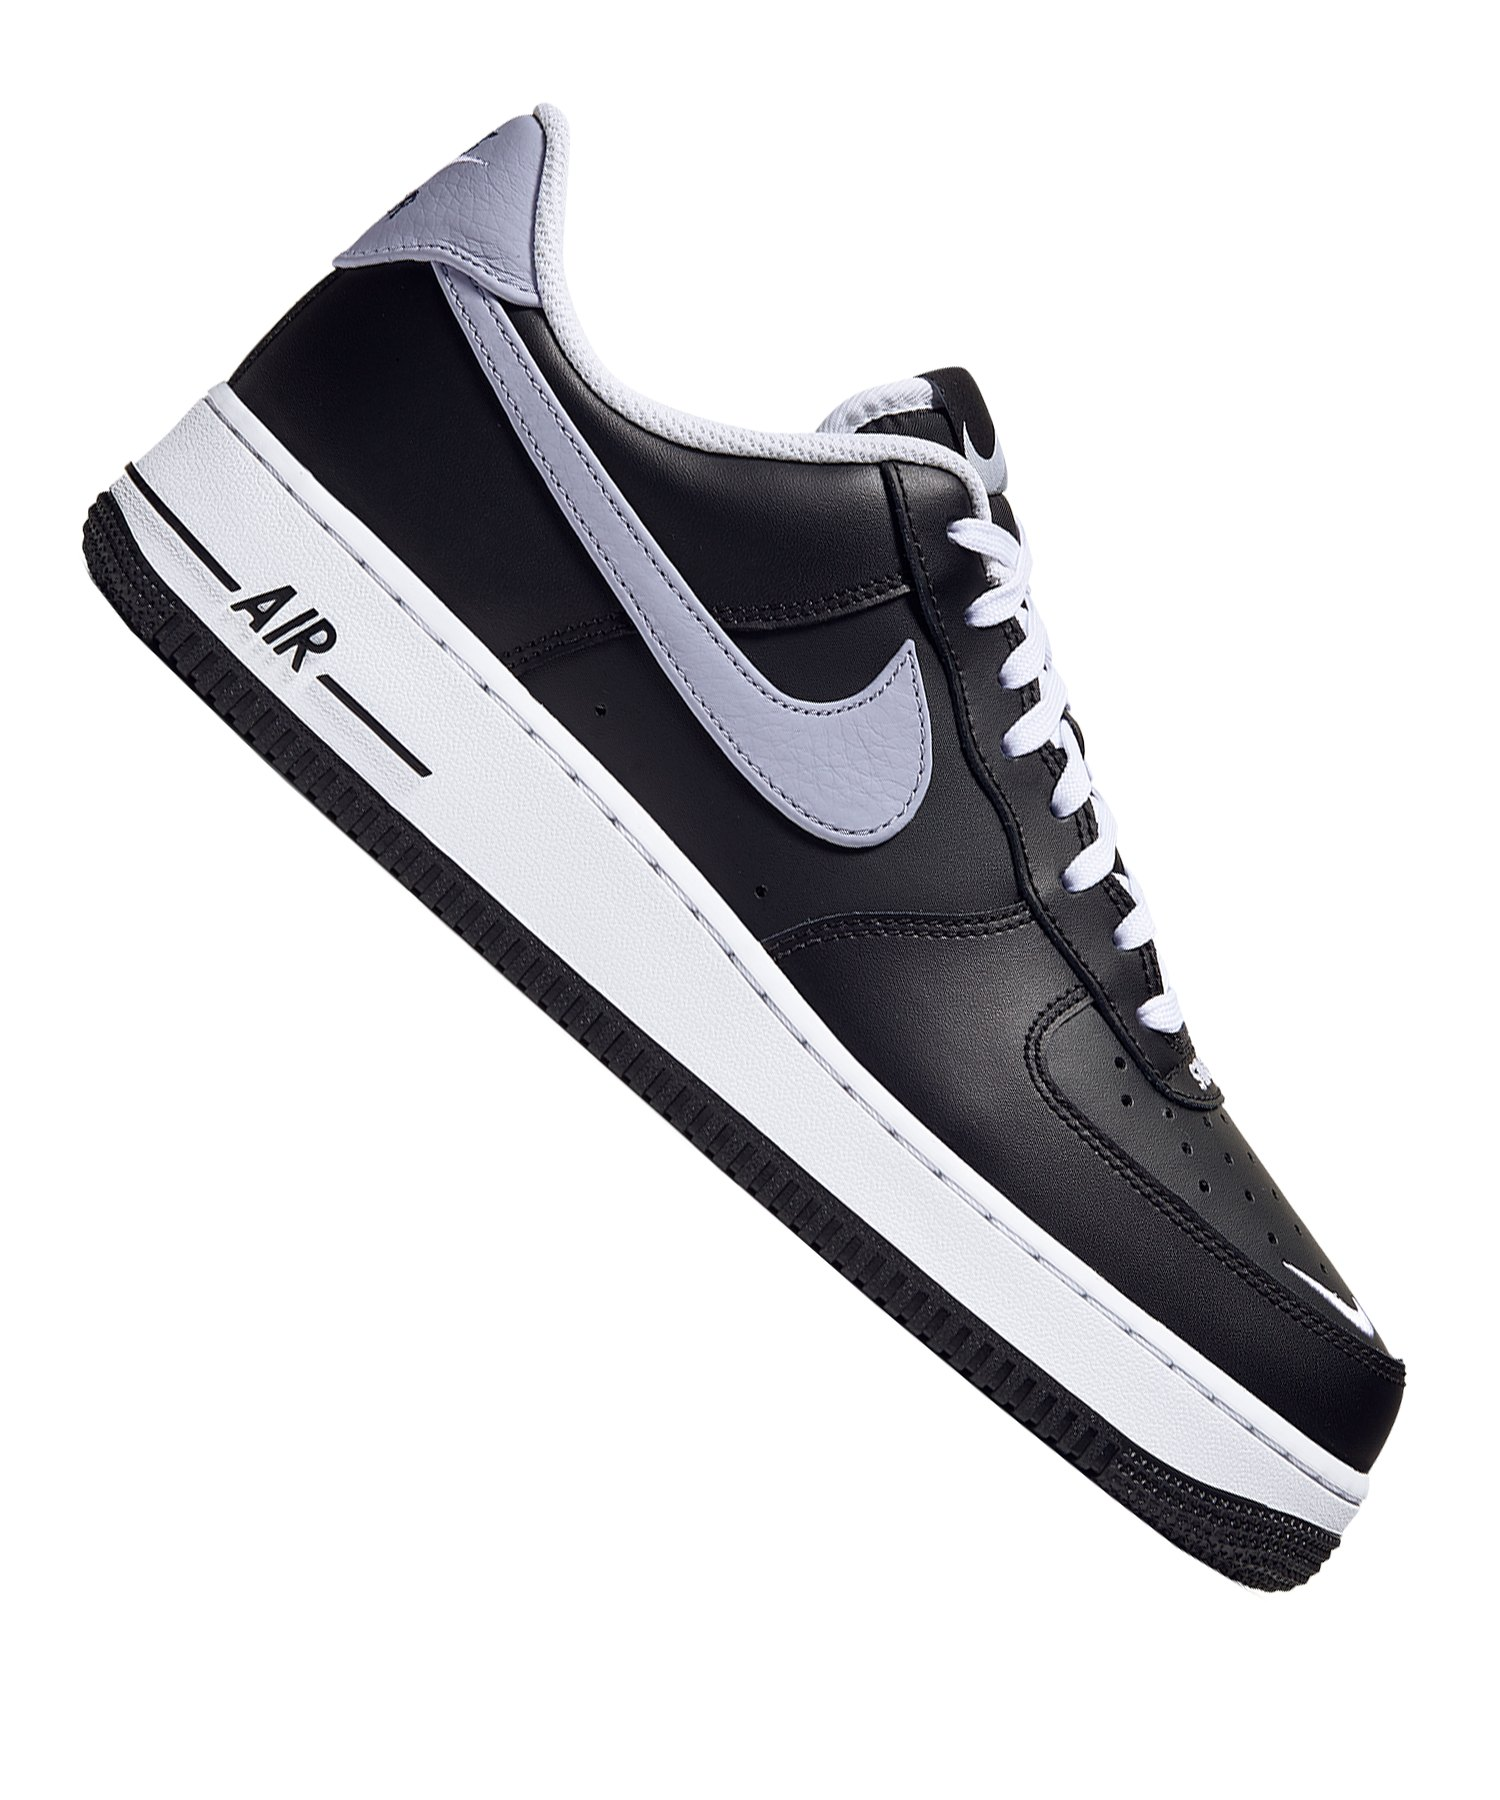 2018 Herren Freizeitschuhe Nike Air Force 1 '07 LV8 Schwarz